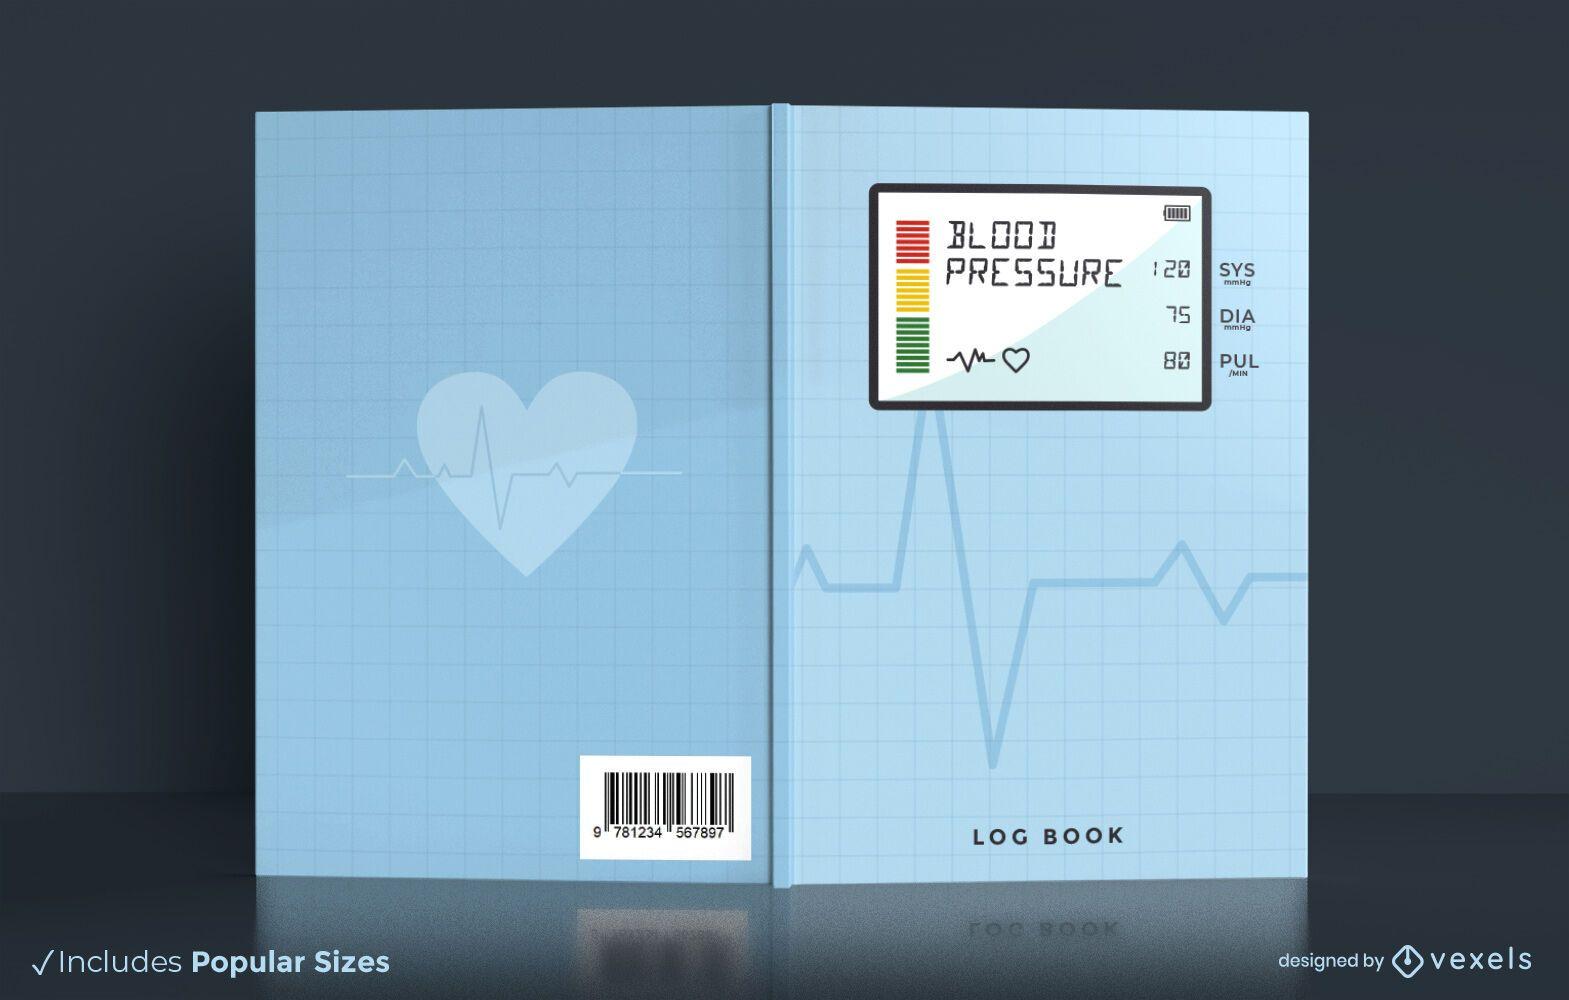 Health blood pressure log book cover design